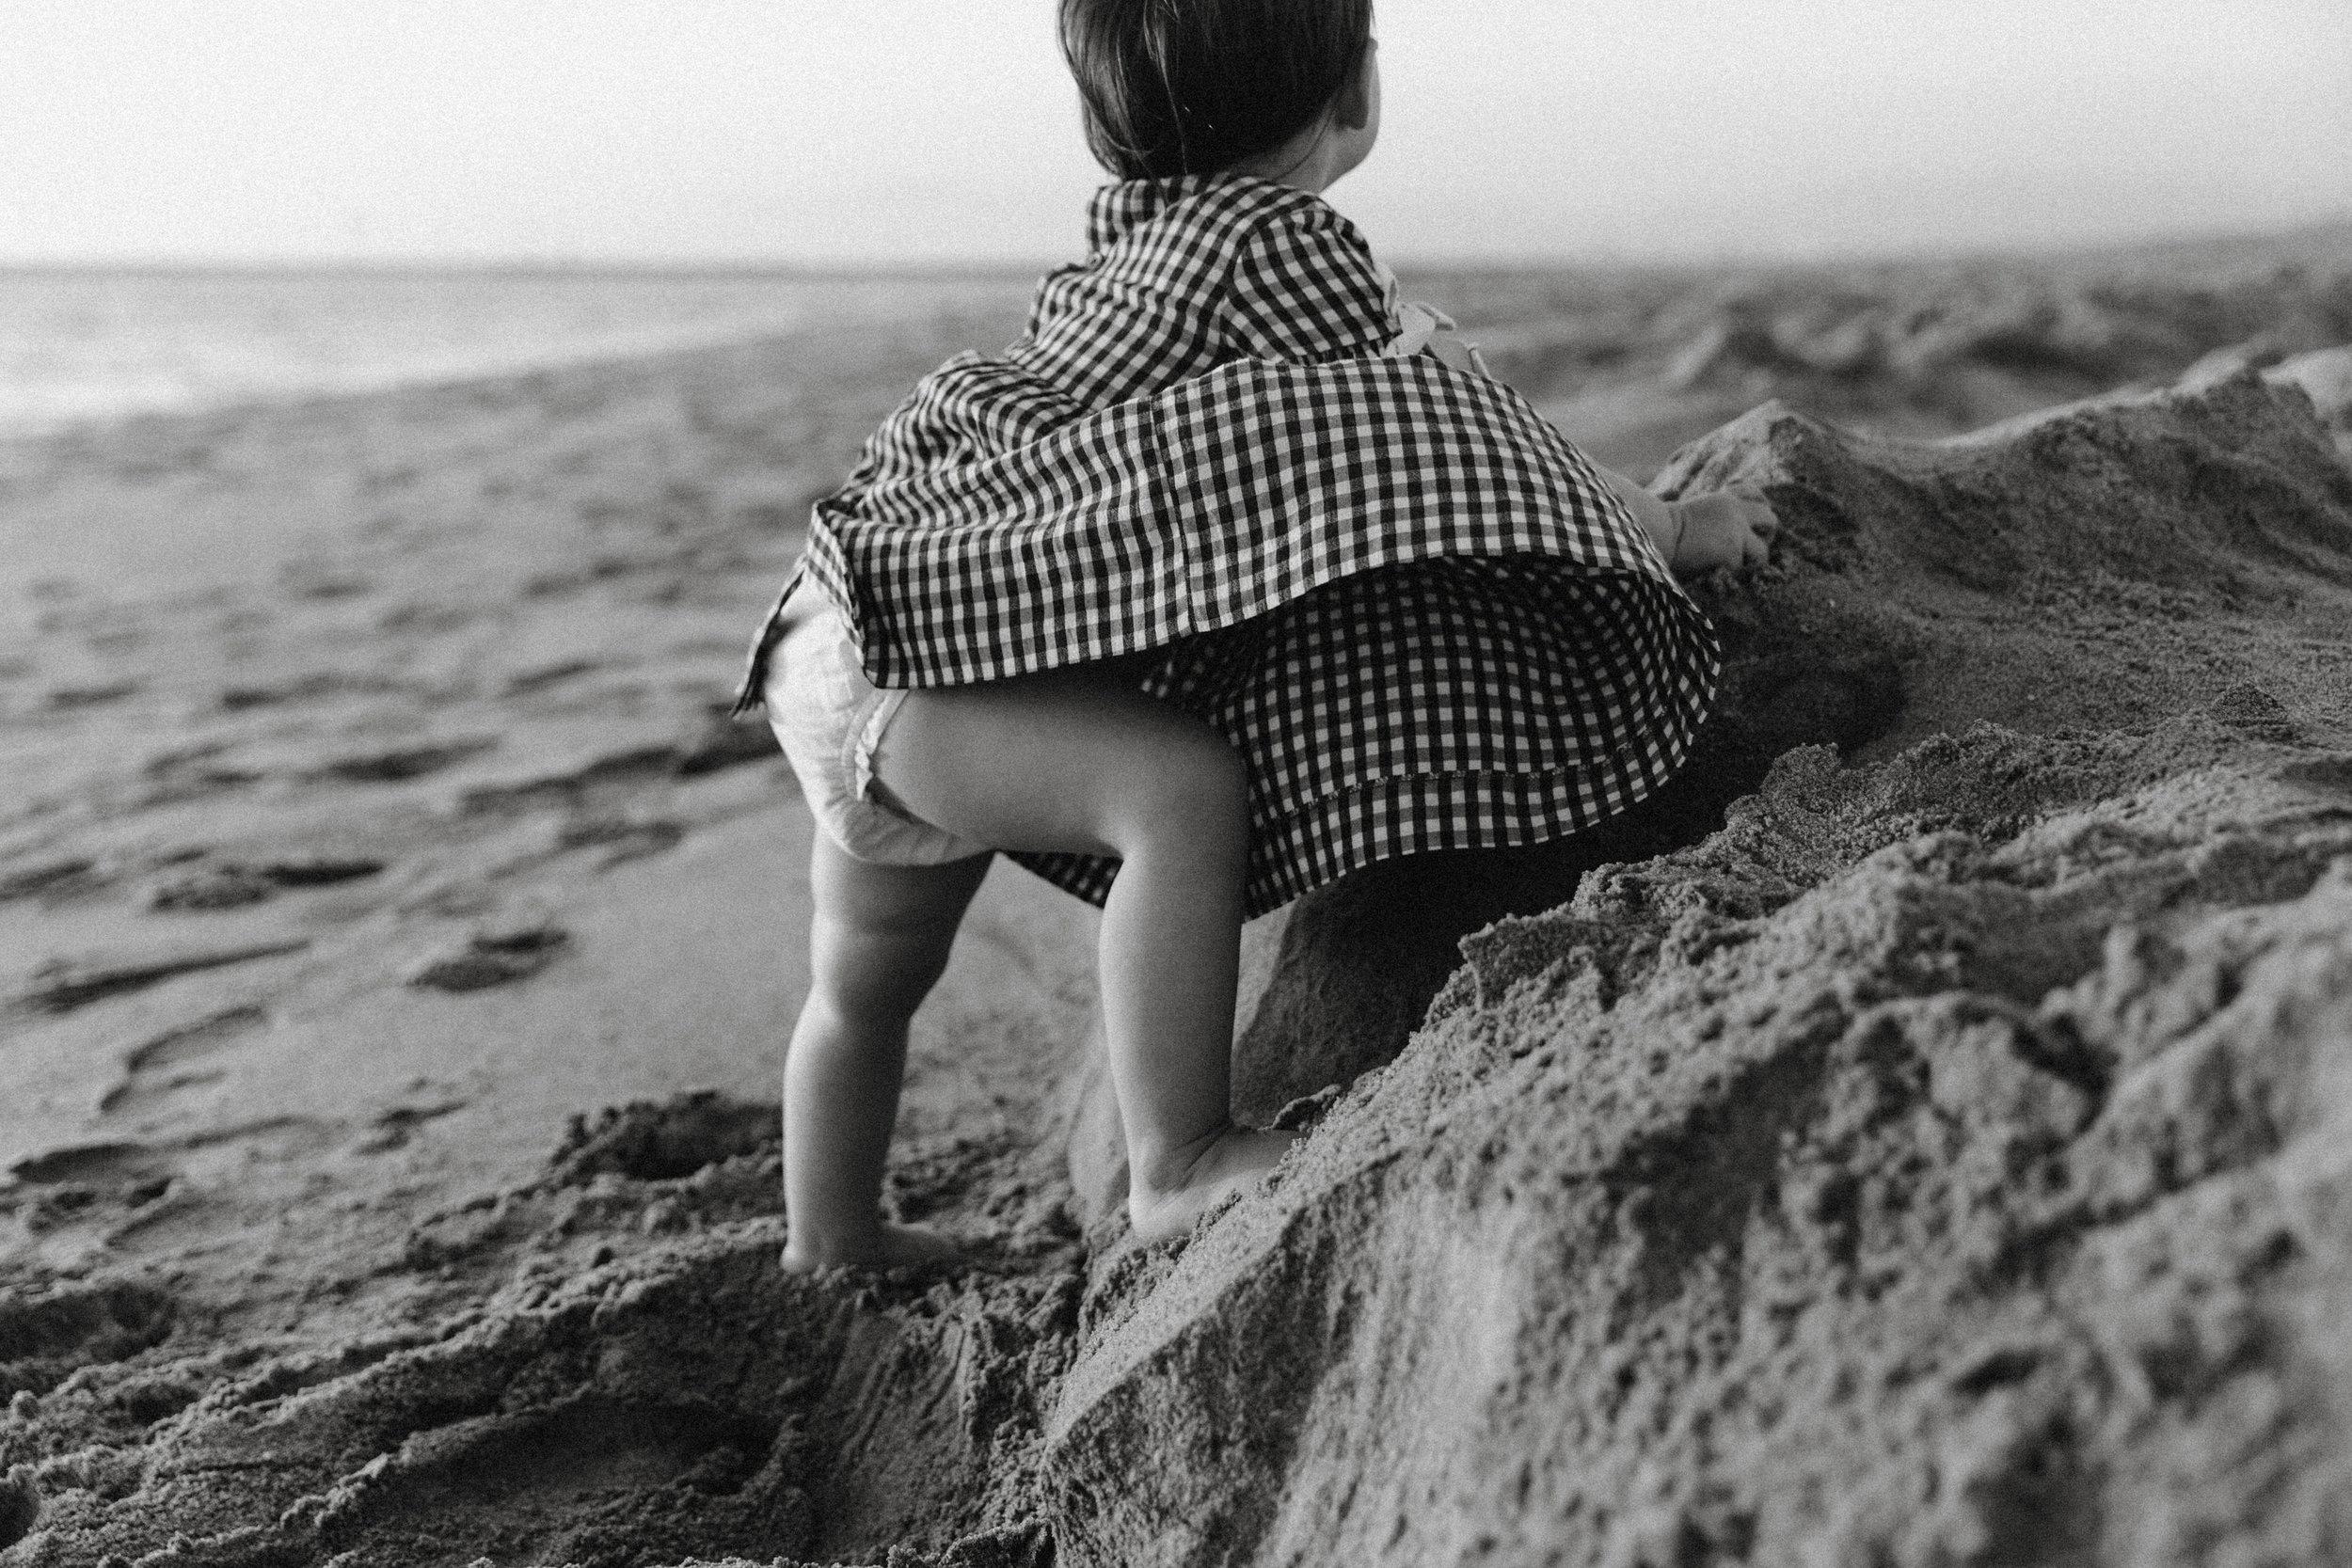 isabel_nicki-sebastian-photography-79.jpg